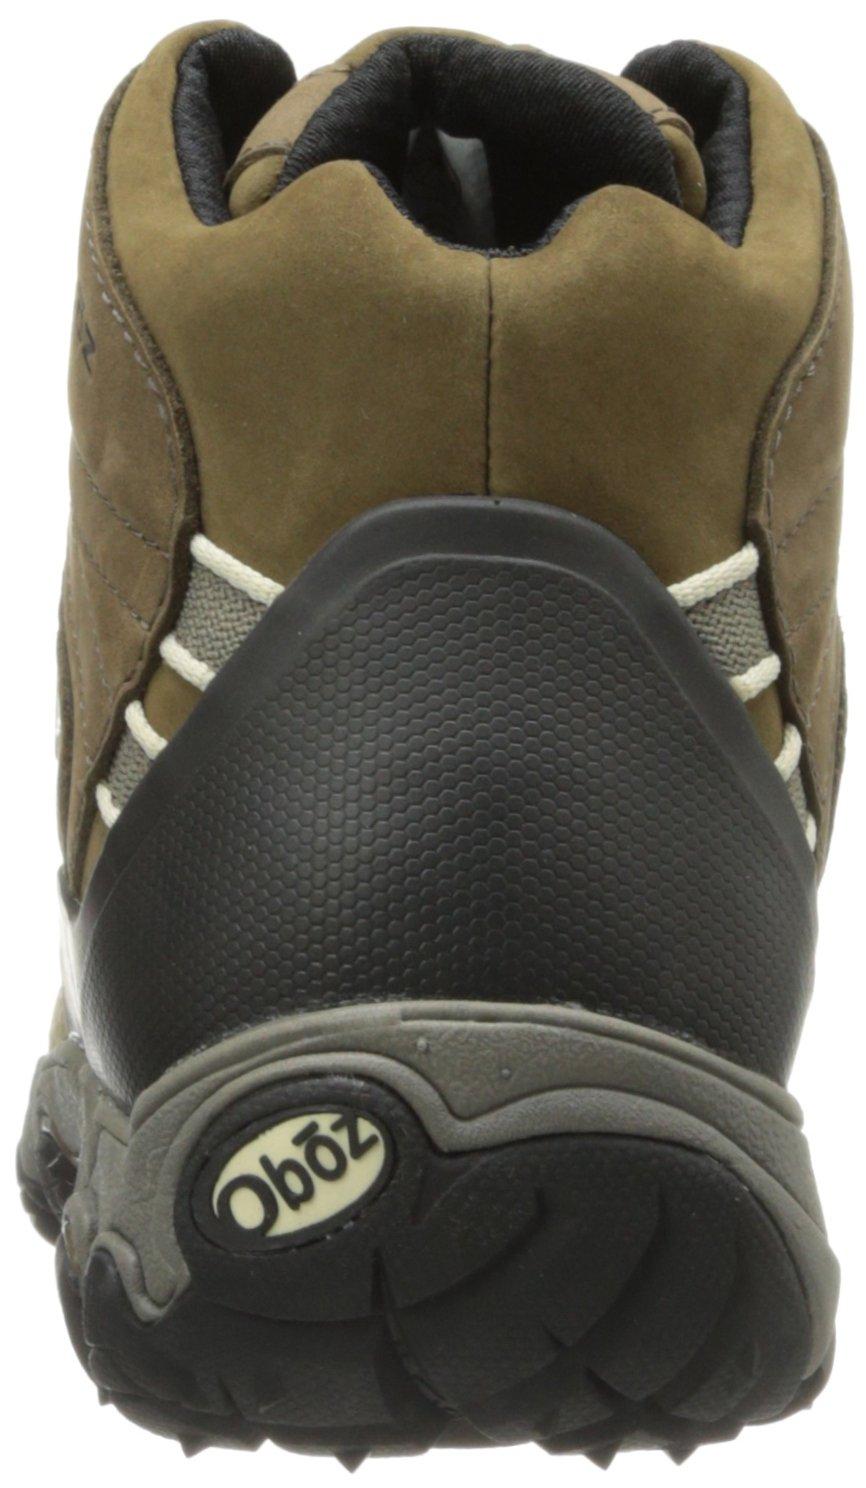 Oboz Women's B01N9XQWUL Bridger B-DRY Hiking Boot B01N9XQWUL Women's 7 C US|Walnut 88d46b